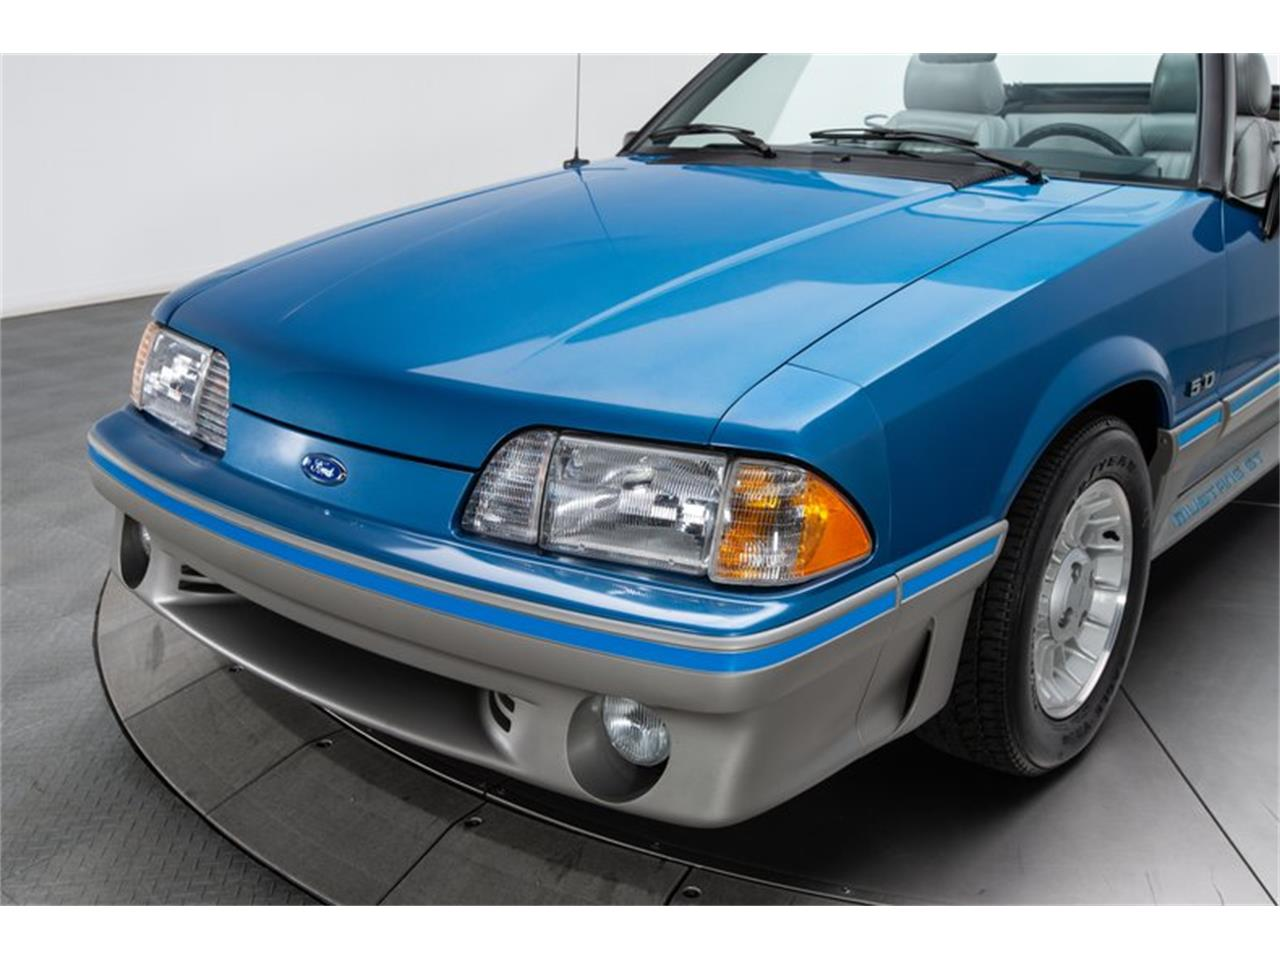 Mustang 1989